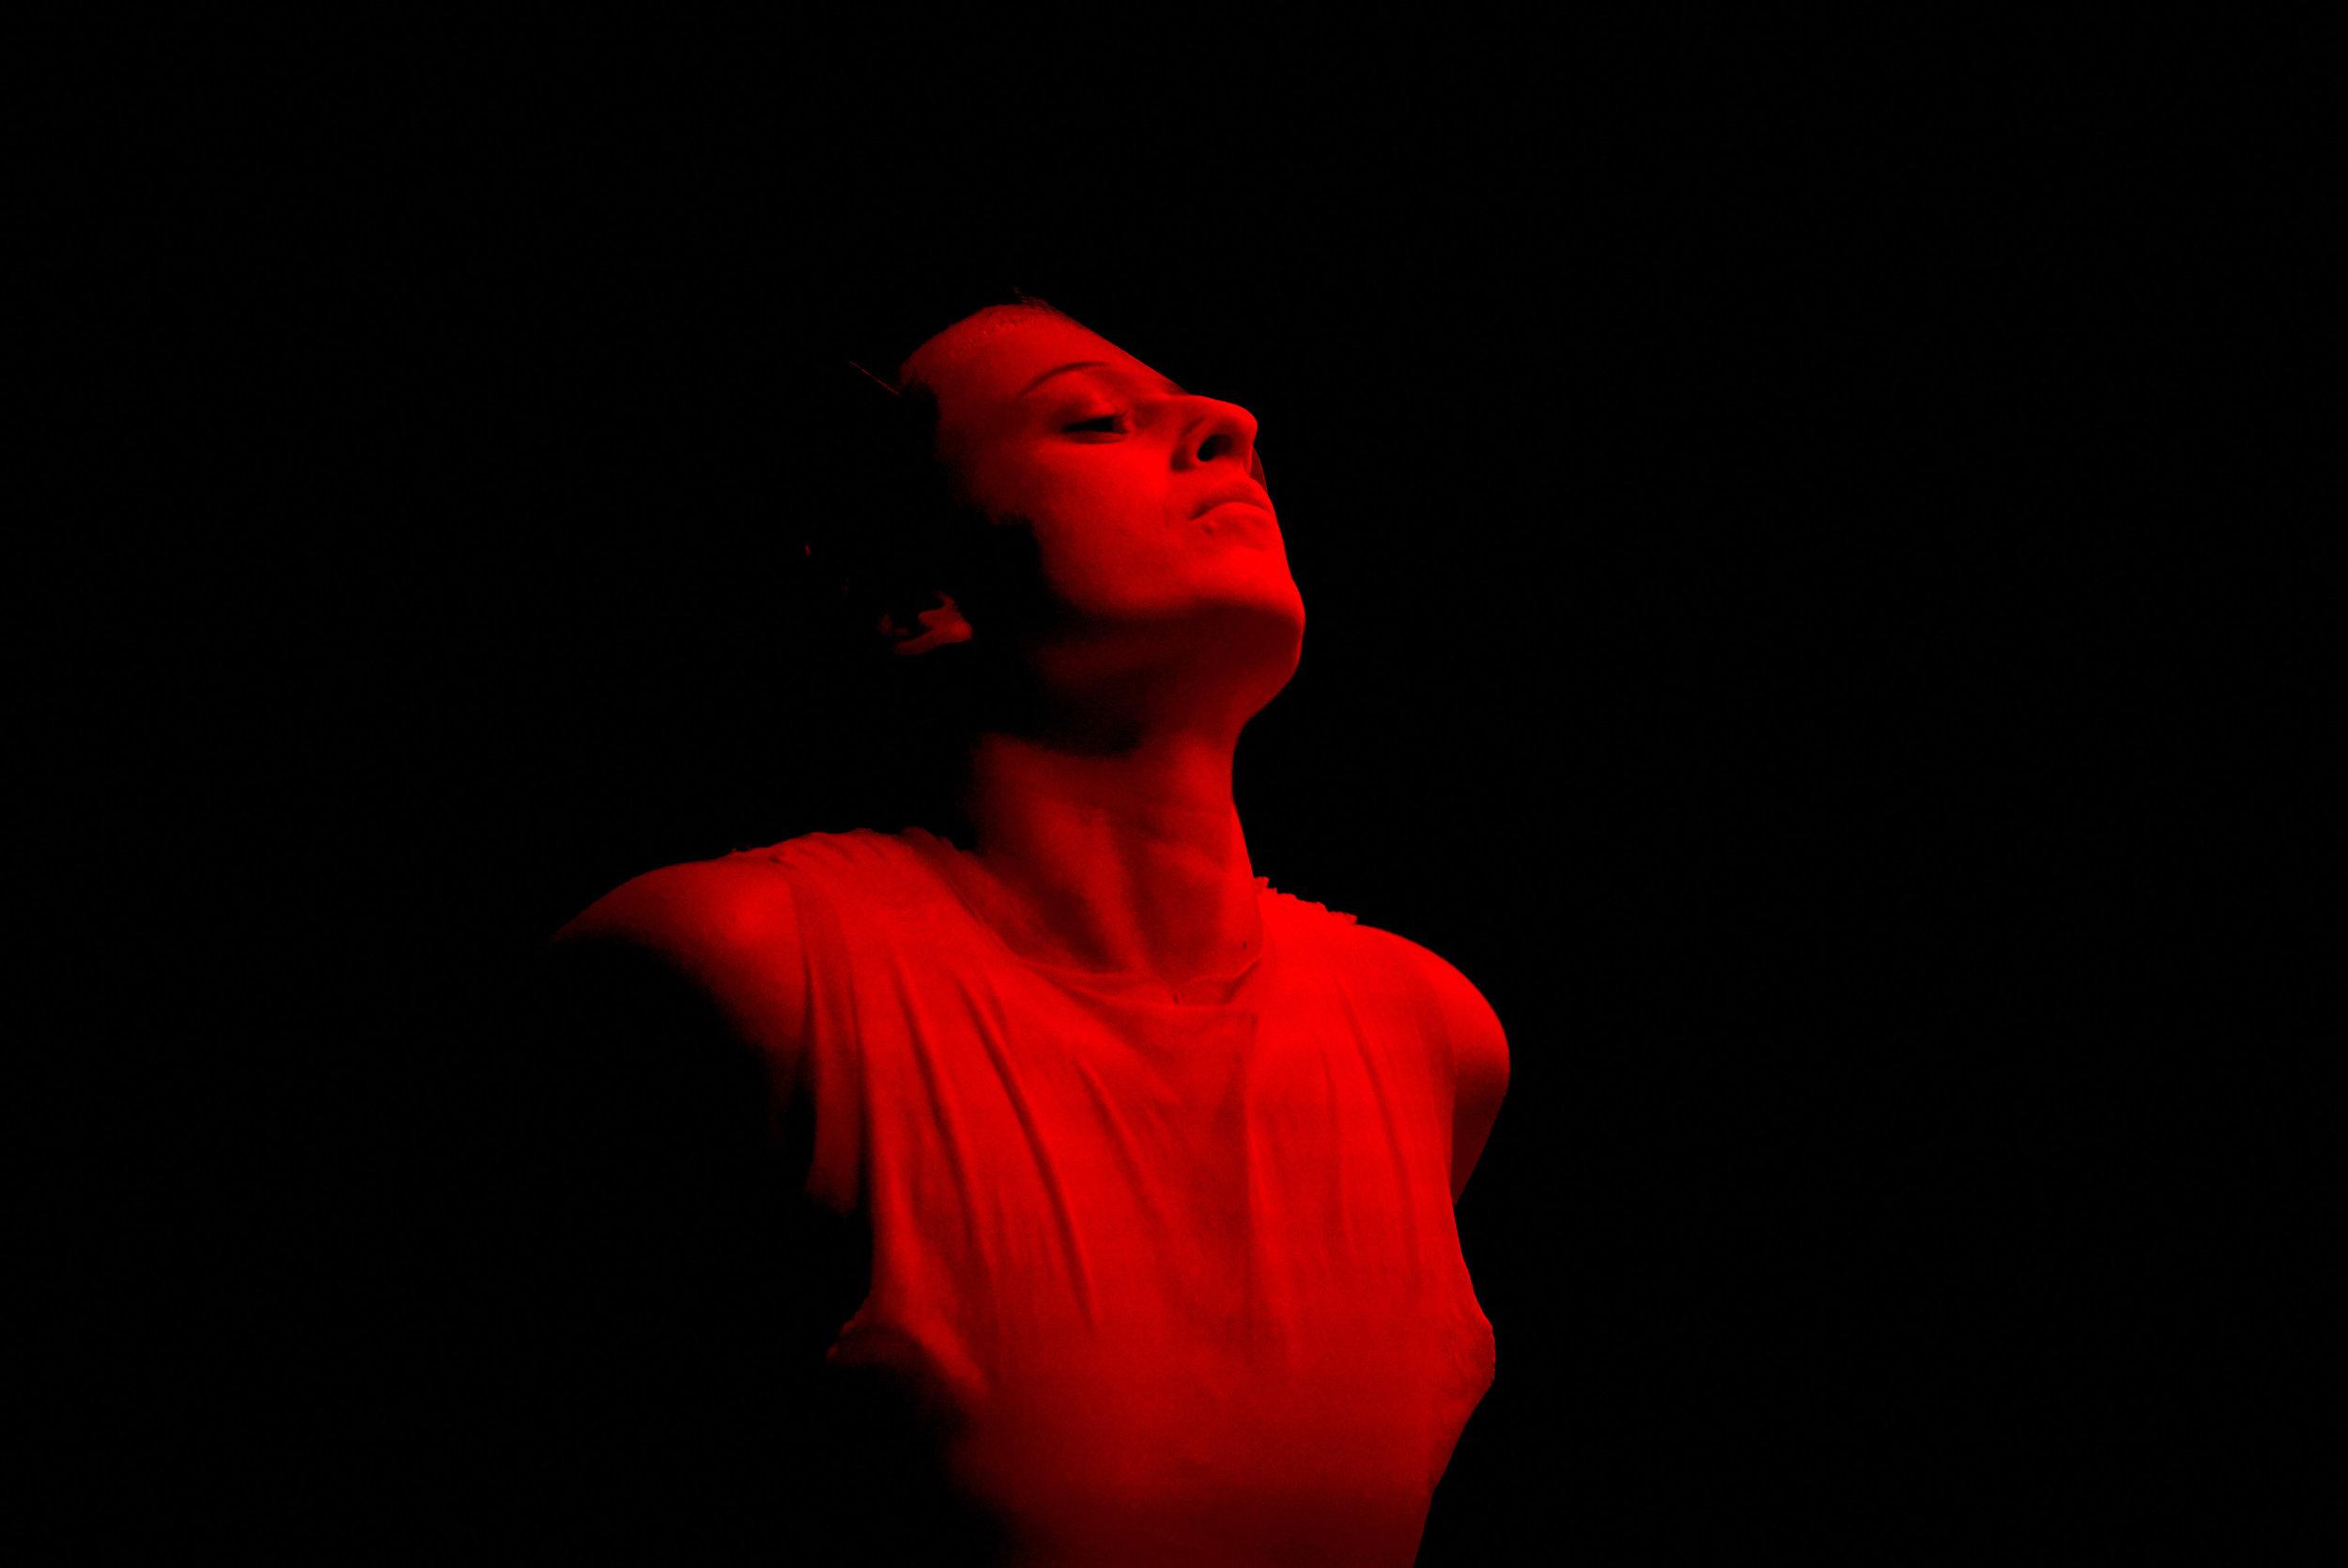 mardi-culturel-td-danse-danse-la-otra-orilla-van-grimde-corps-secrets-14.jpg